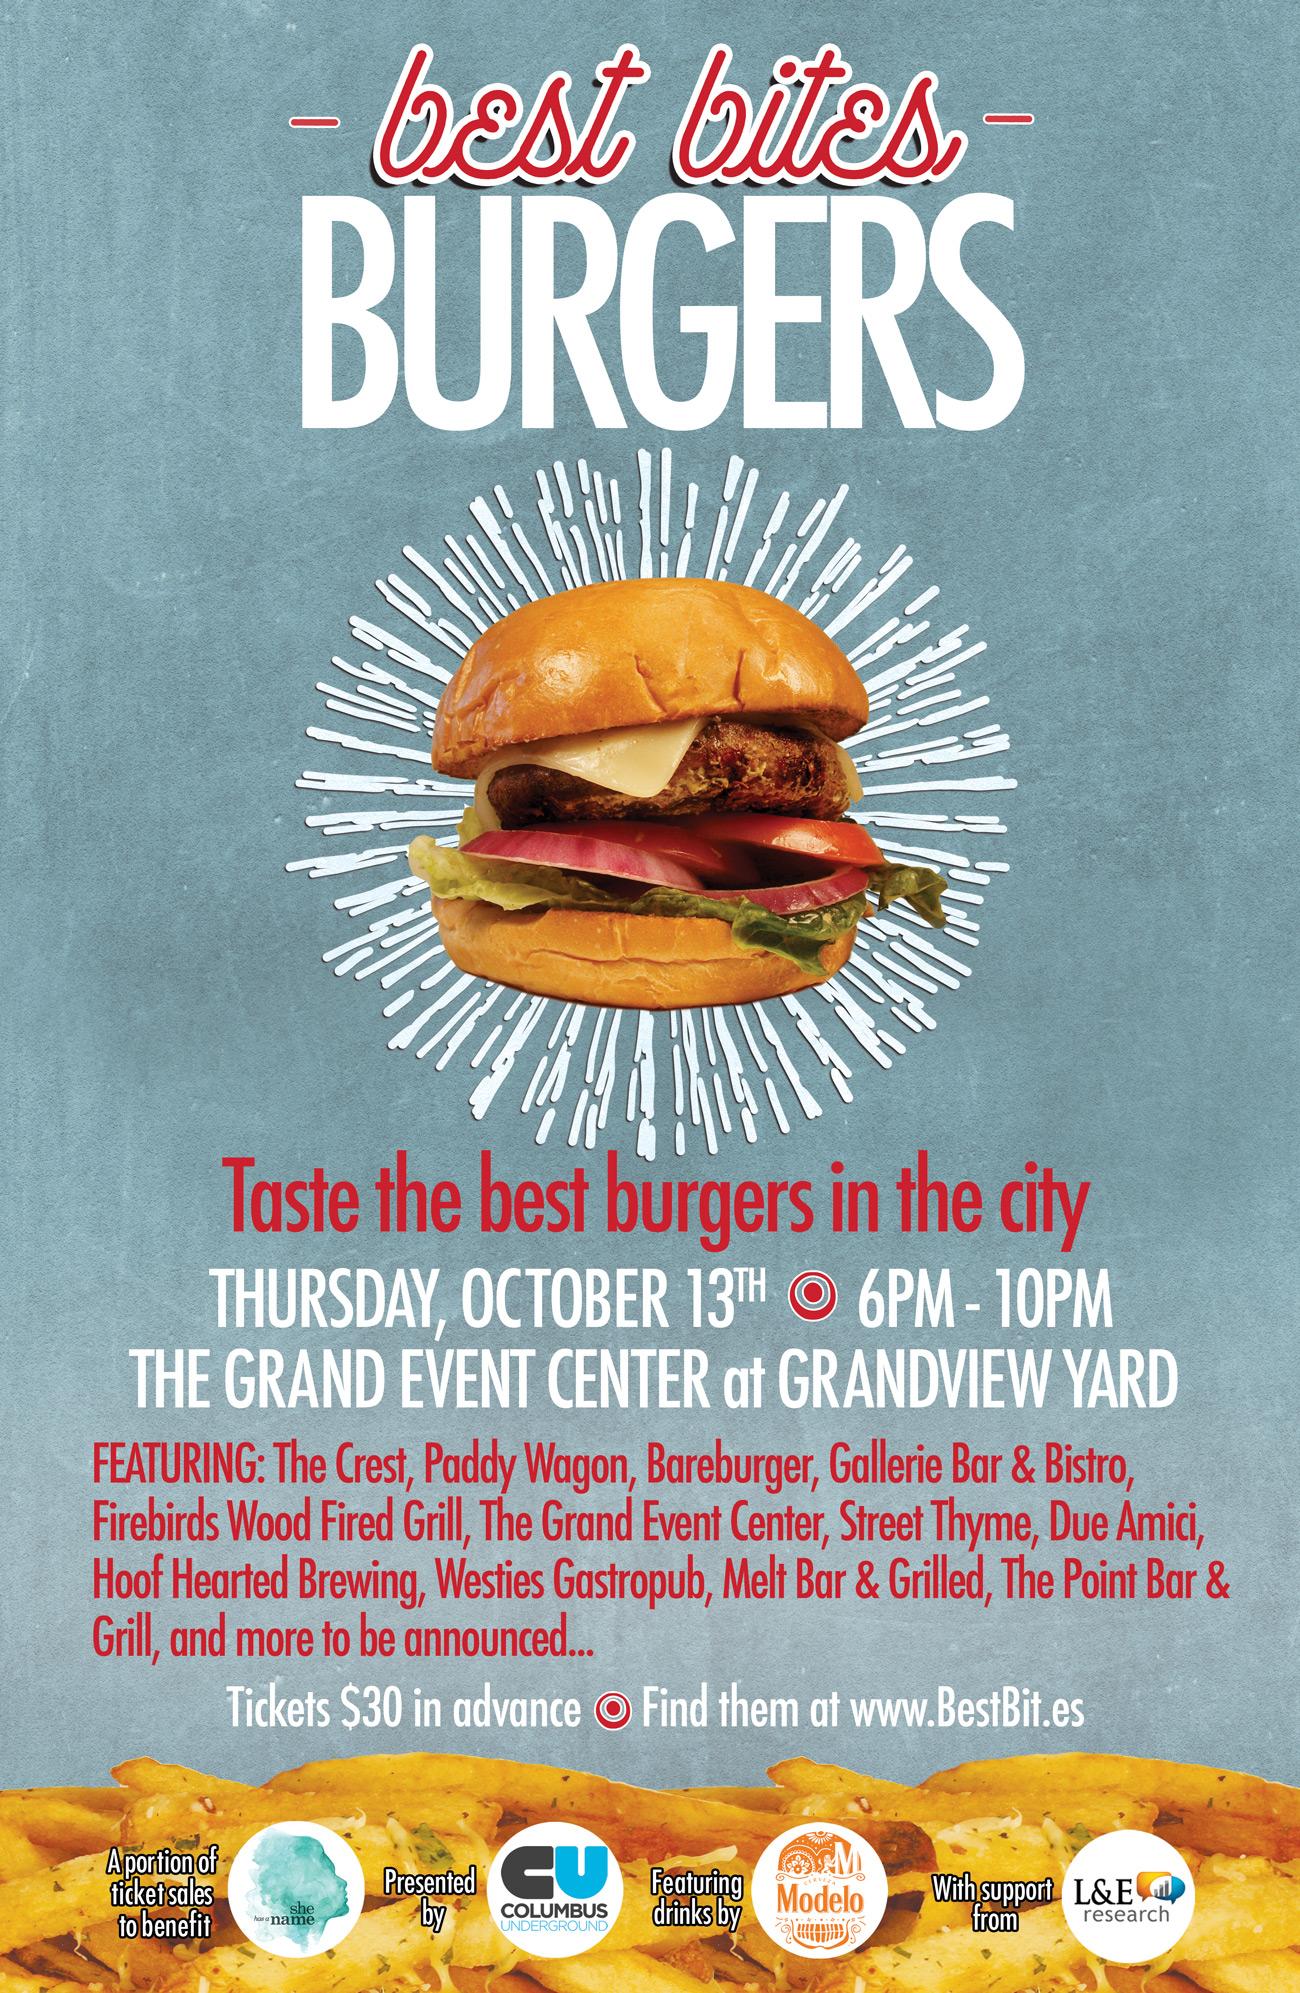 Best Bites Burgers Flyer